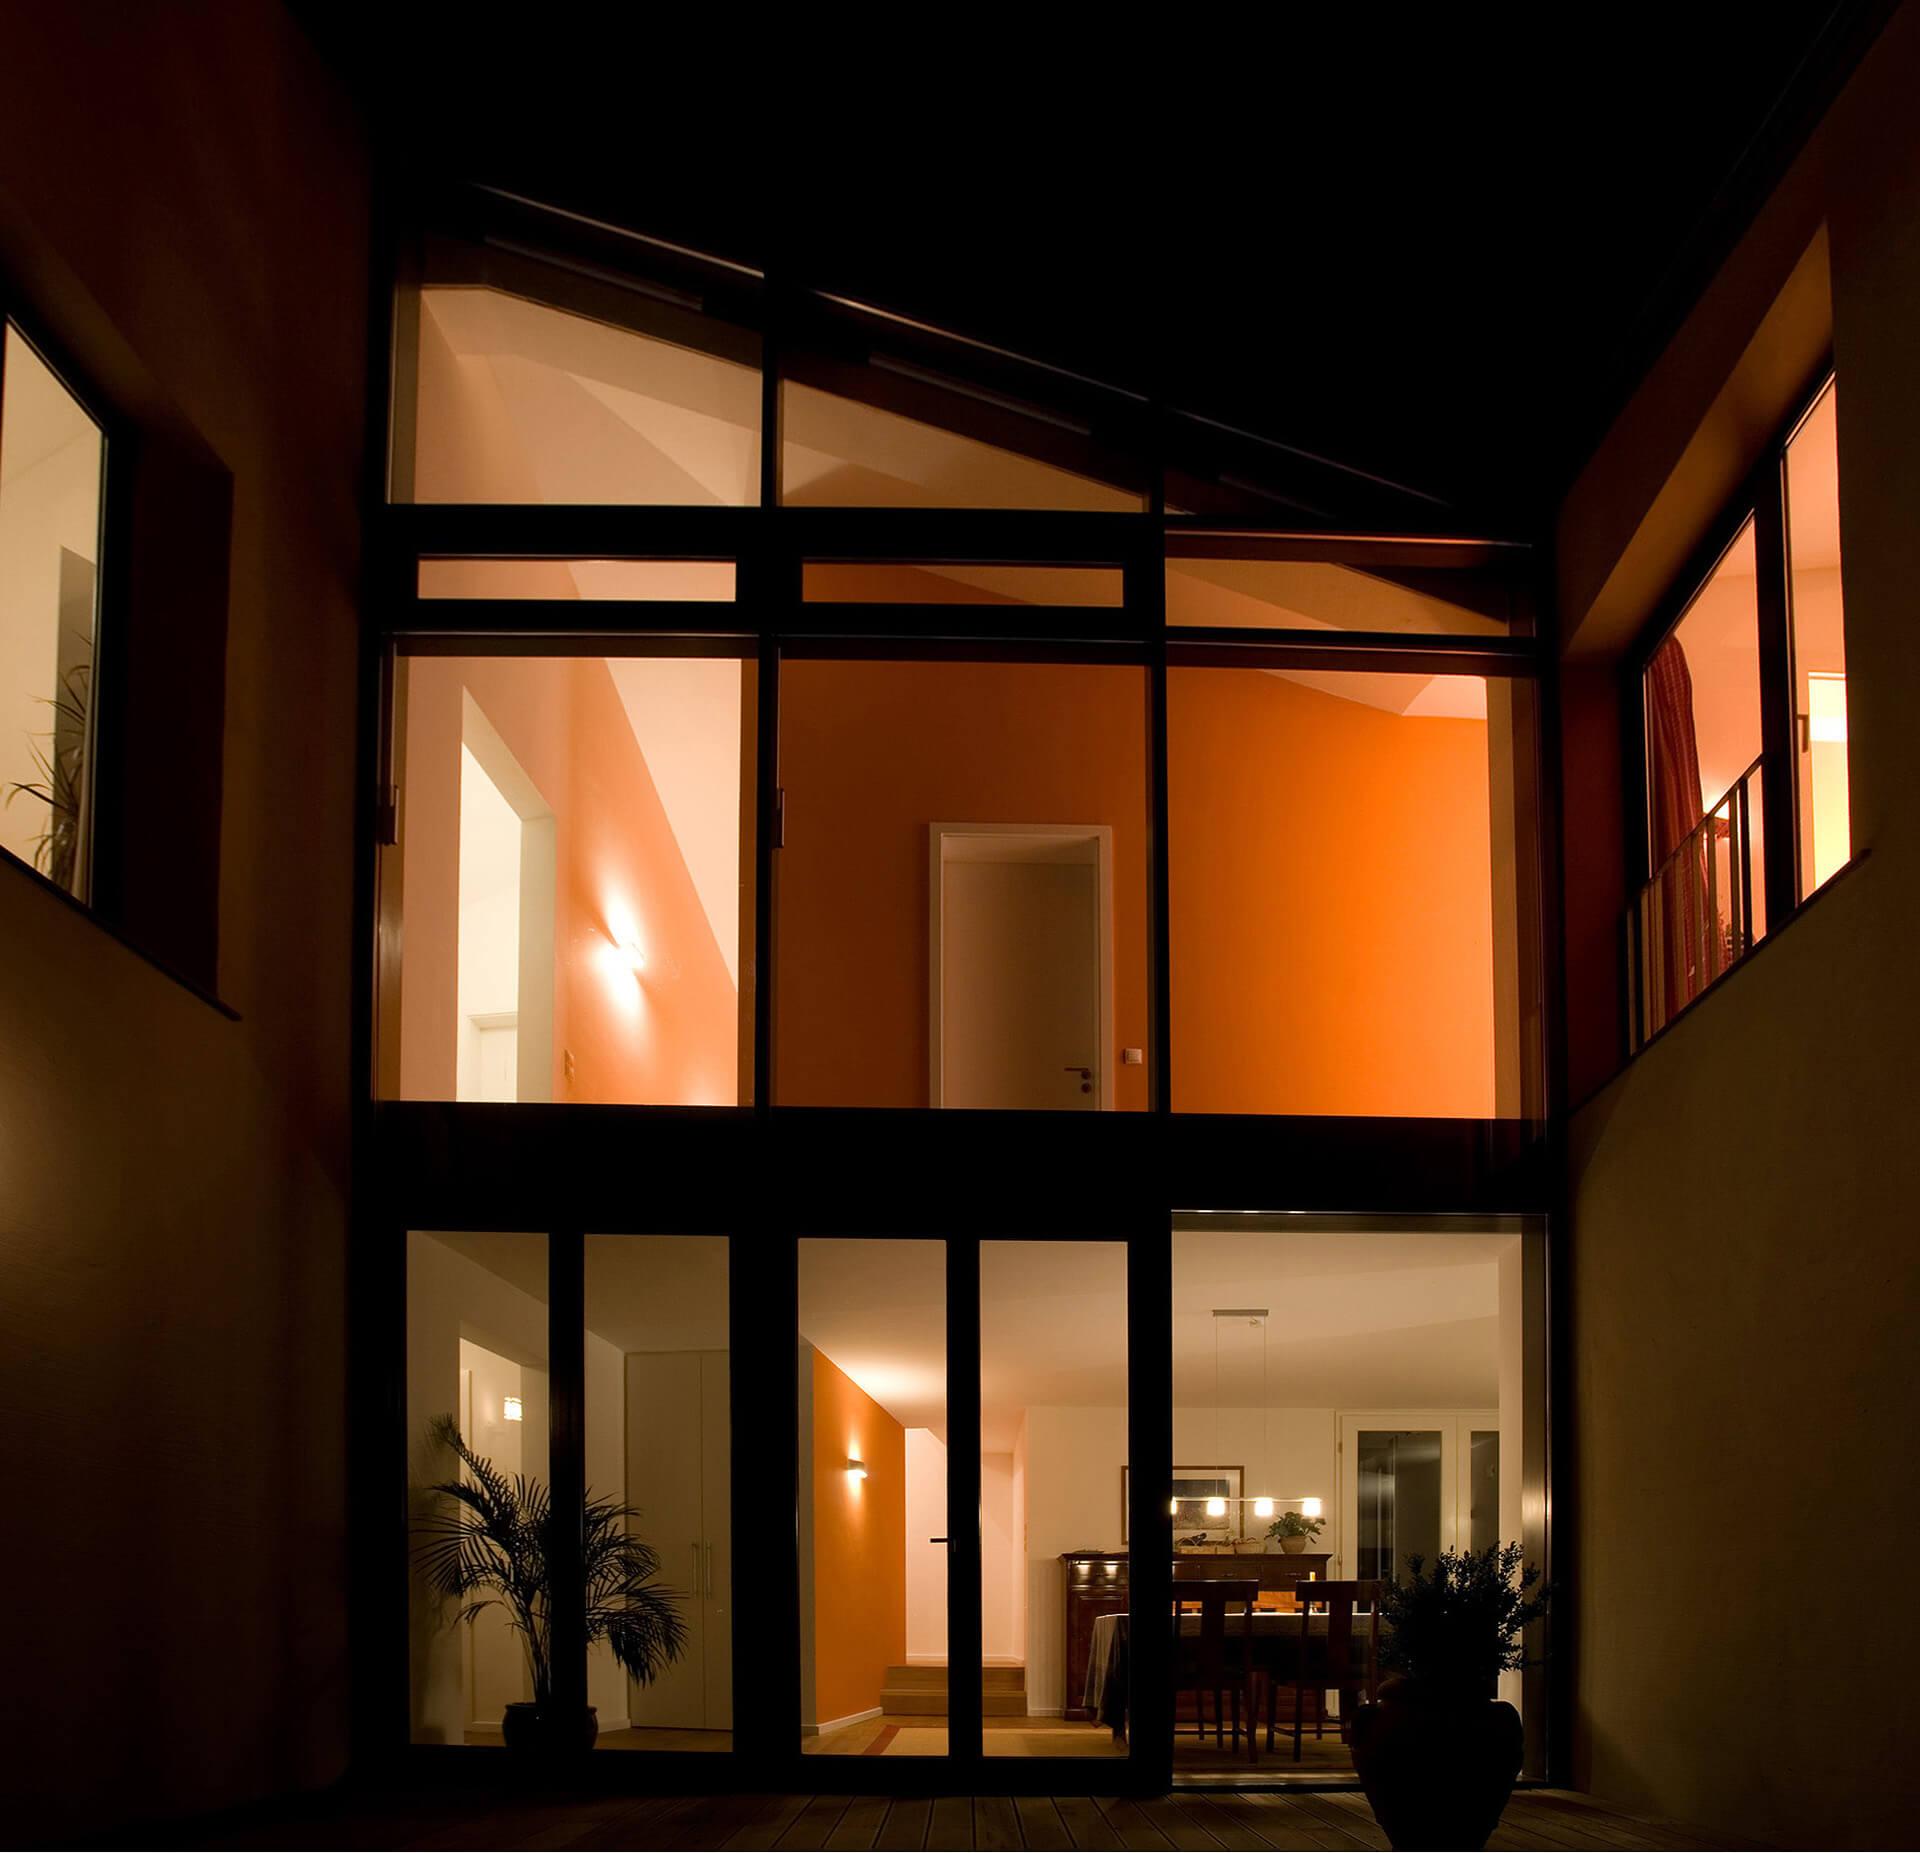 Haus Seeblick Duisburg: Haus HA – Individuelles Einfamilienhaus In Duisburg